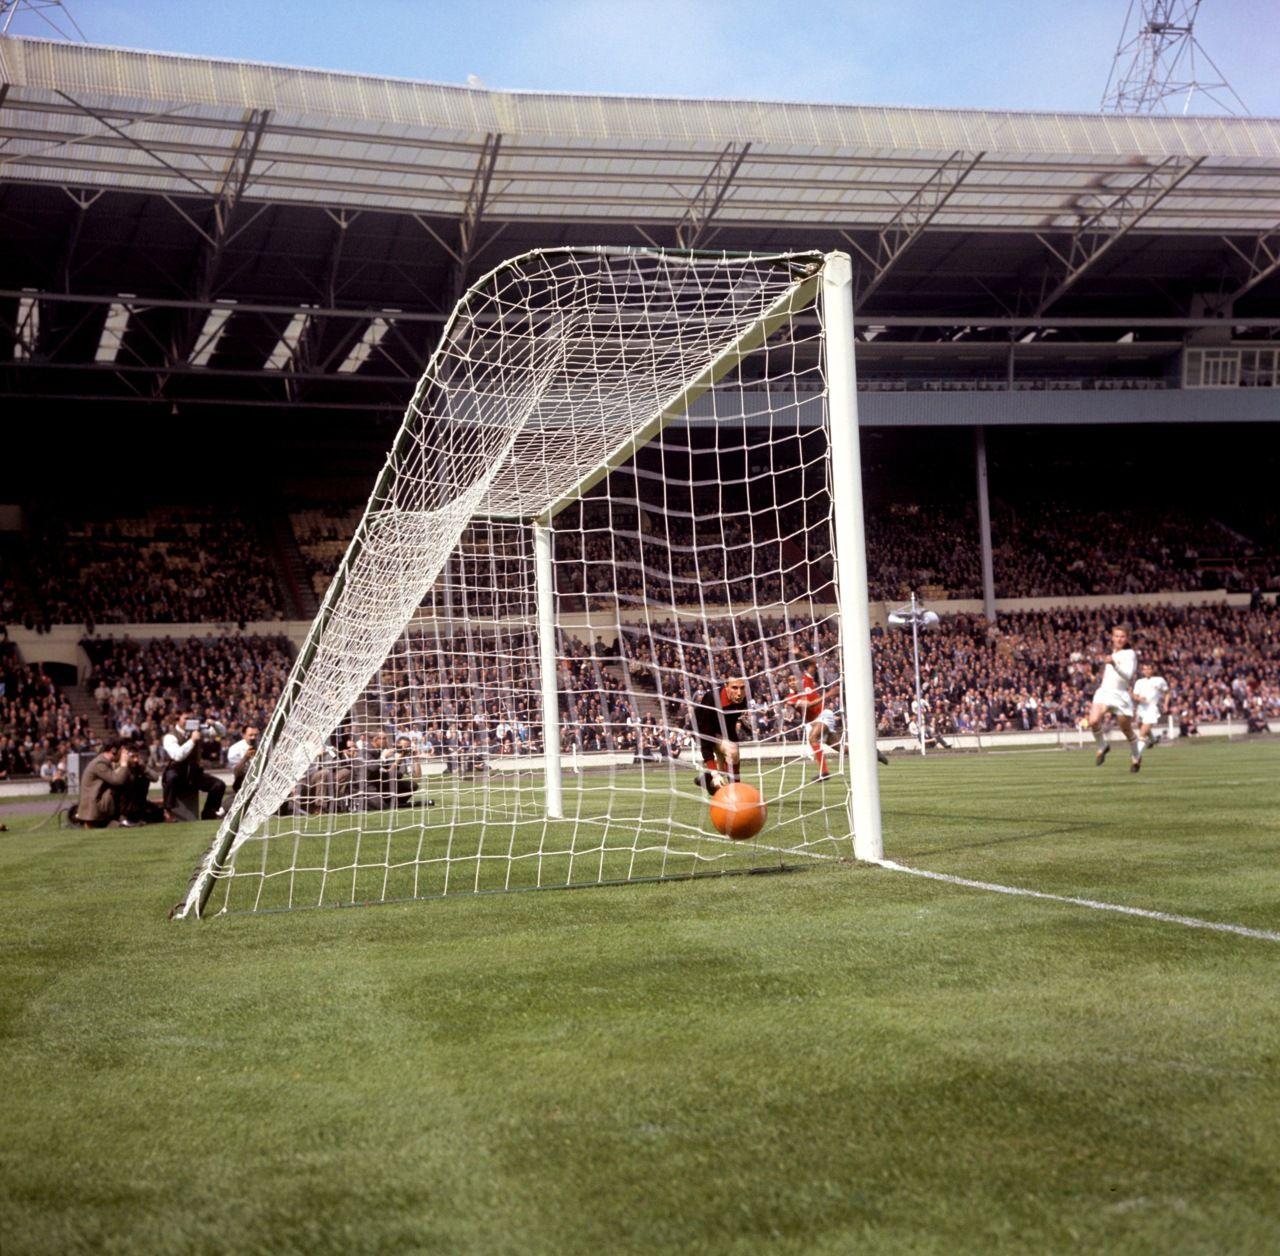 Primer gol del Benfica en la final de la Copa de Europa de 1963 obra de Eusebio